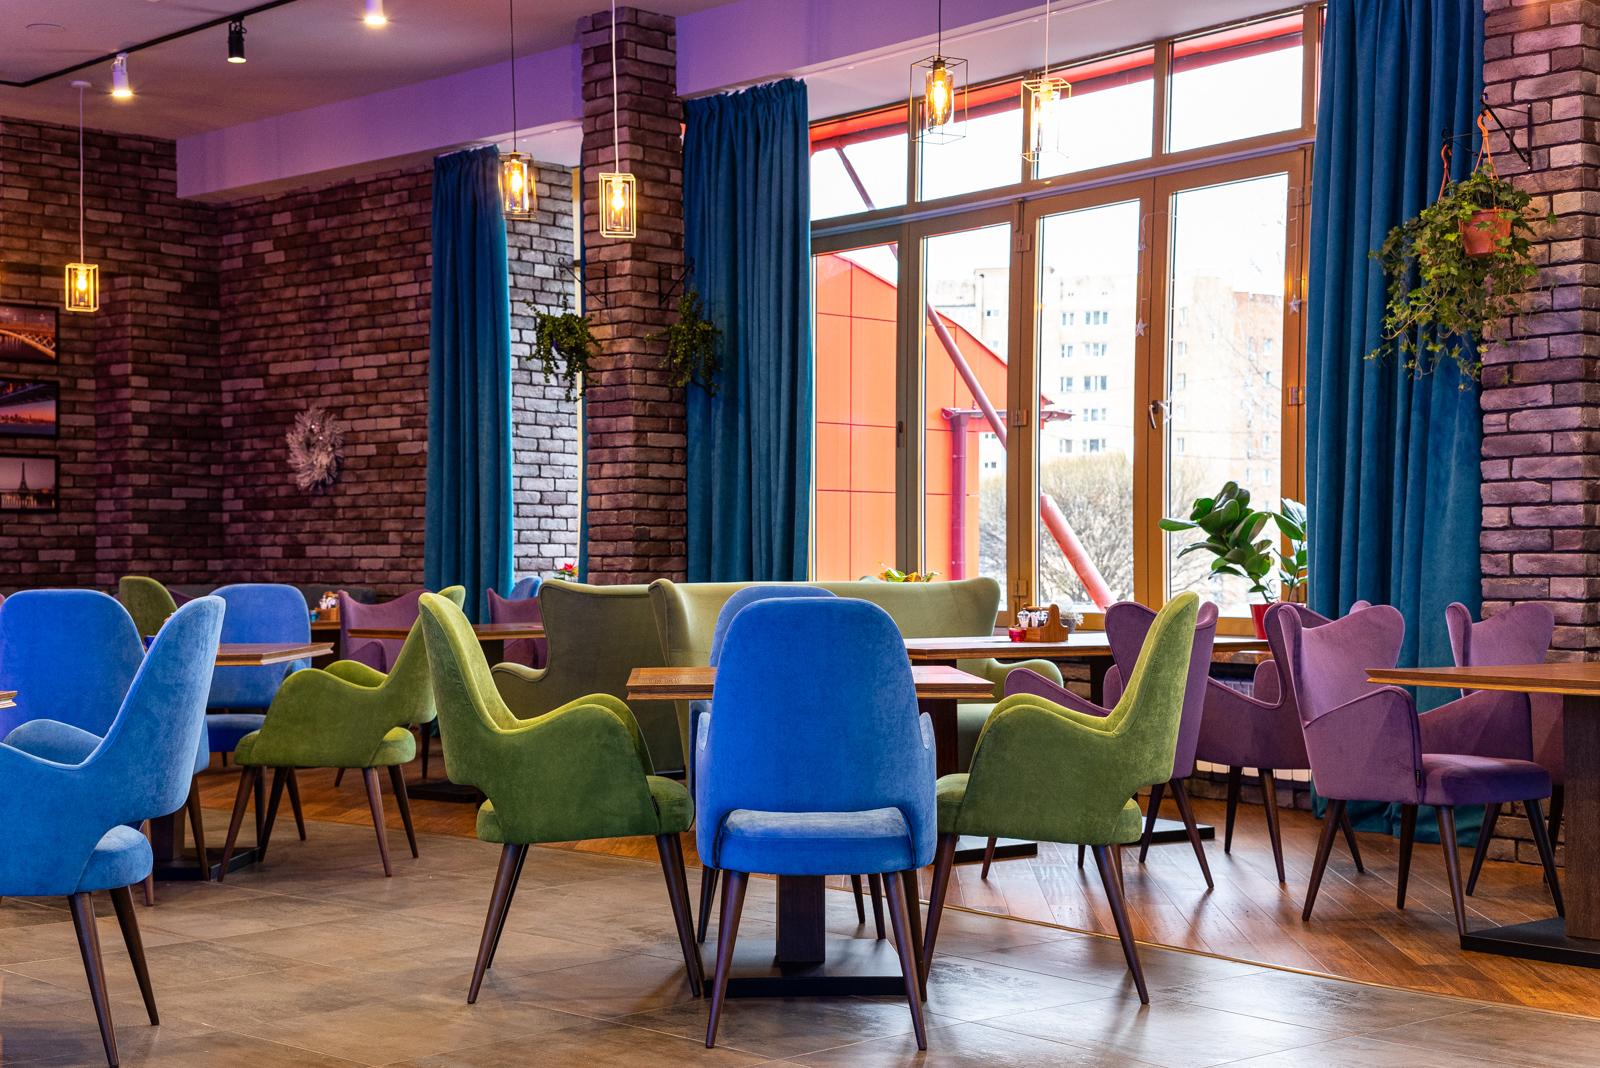 дизайн интерьера ресторана, ресторан-бар, дизайн ресторана в стиле лофт, дизайн ресторана под ключ, дизайн коммерческих помещений, дизайн интерьера, дизайн ресторана